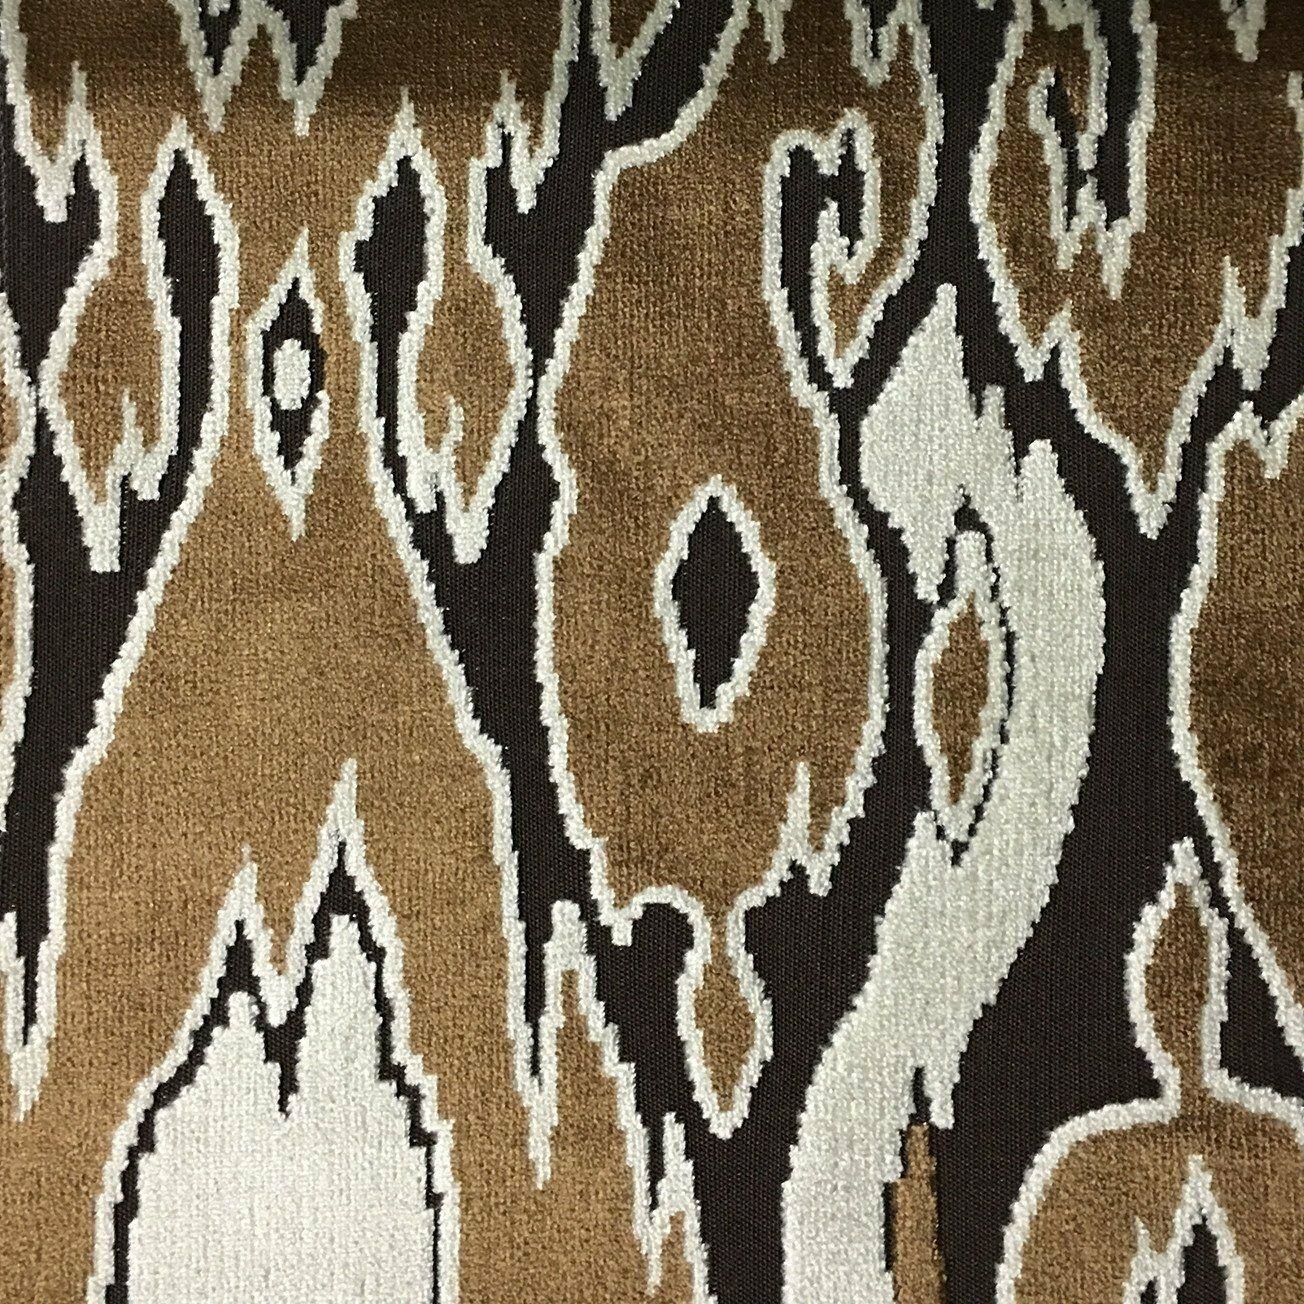 Indigo Velvet Upholstery Fabric Leopard Print Cut Velvet Home Decor Upholstery Fabric by the Yard Hendrix Available in 15 Colors